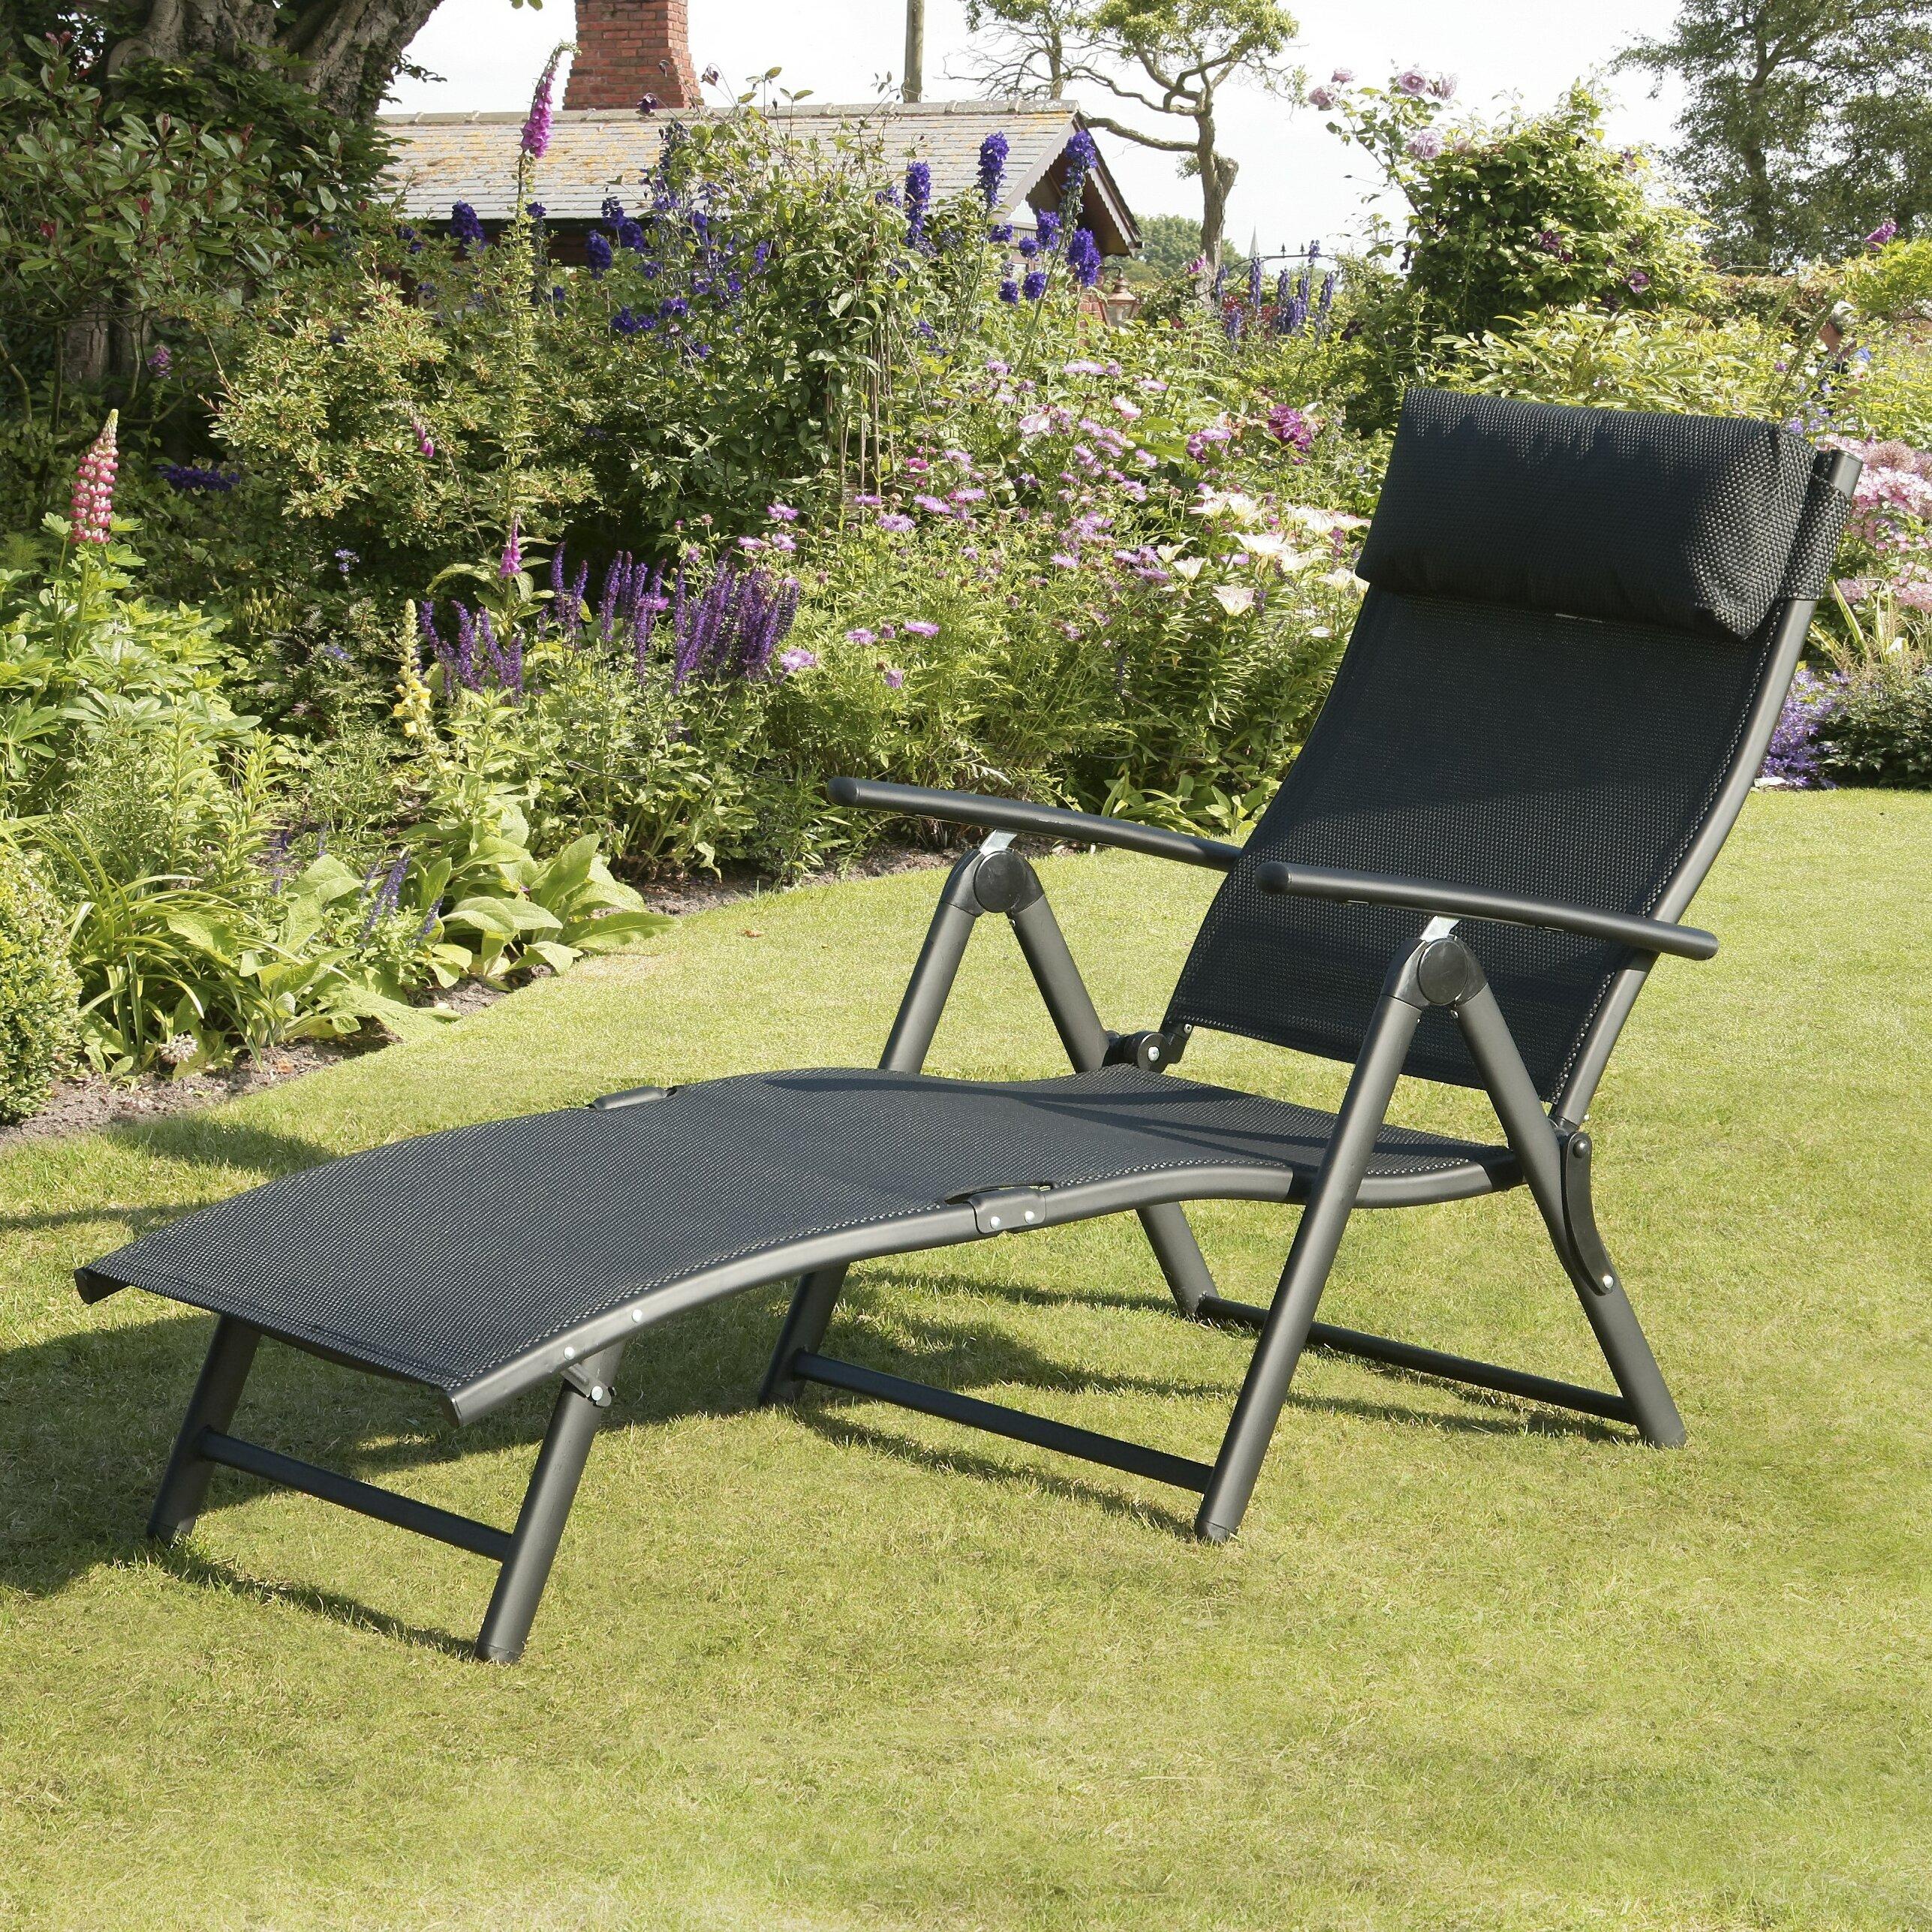 SunTime Outdoor Living Havana Chaise Lounge & Reviews ... on Suntime Outdoor Living id=19060